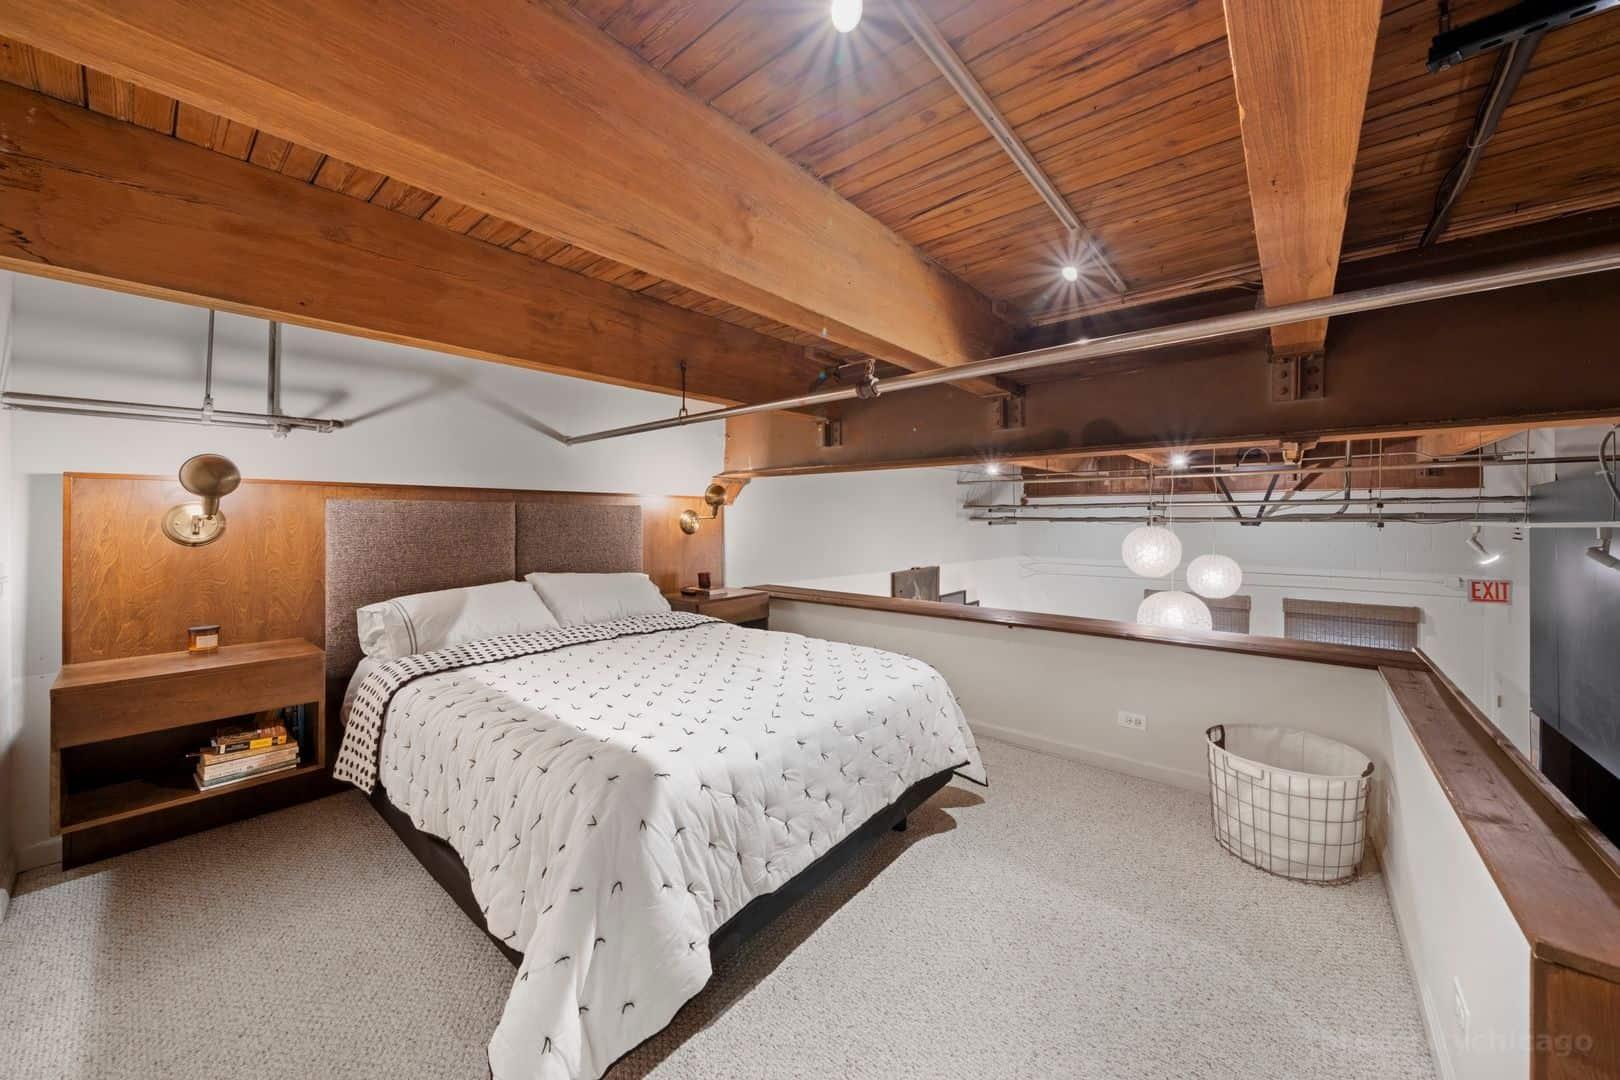 22 N Morgan Street, Unit 106, Chicago IL 60607 - Bedroom